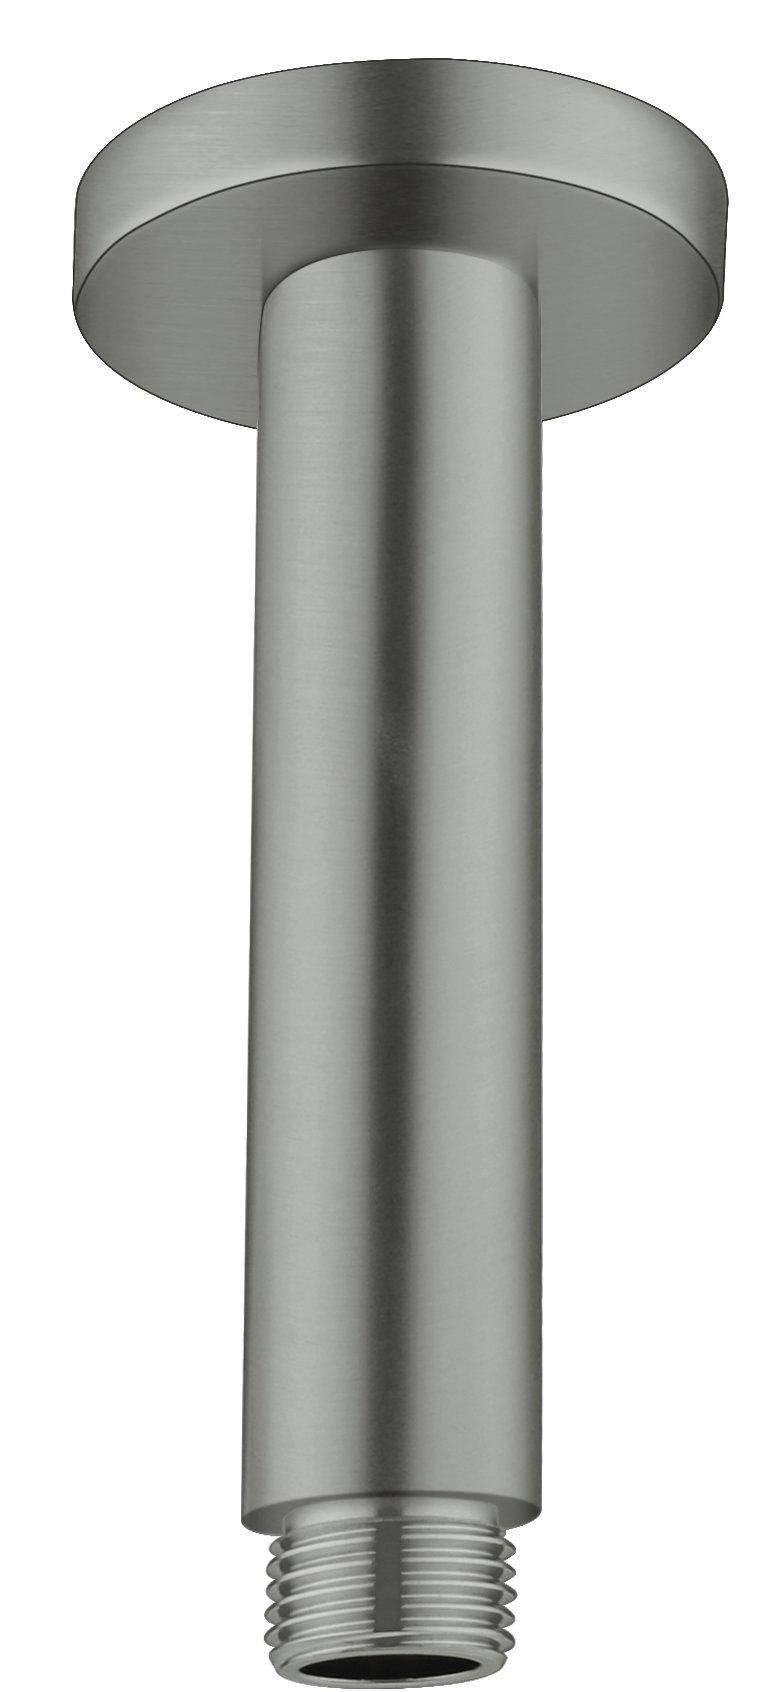 NERO VITRA ROUND CEILING ARM GUN METAL GREY